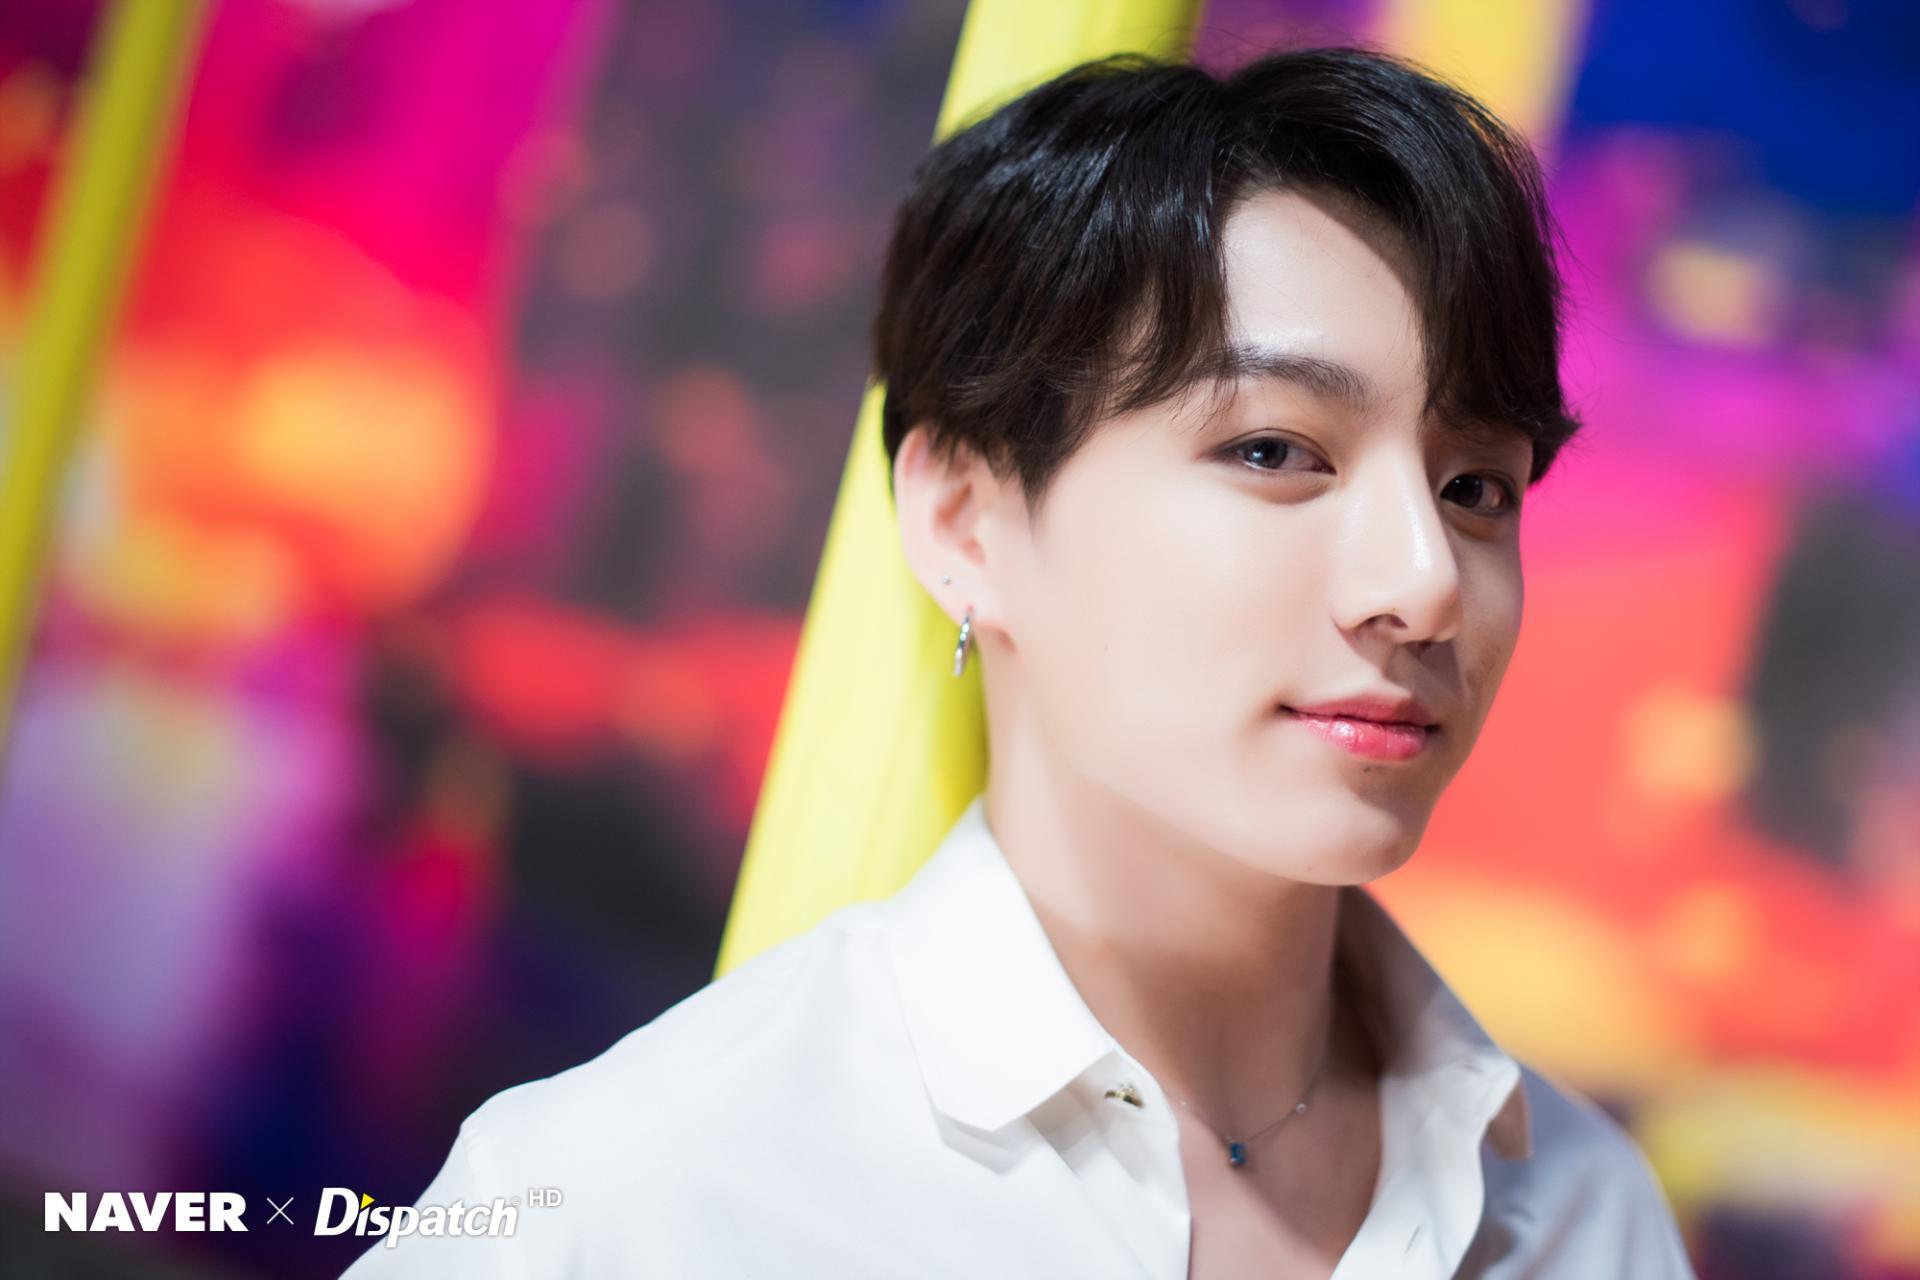 Hình Joongkook đẹp trai cute